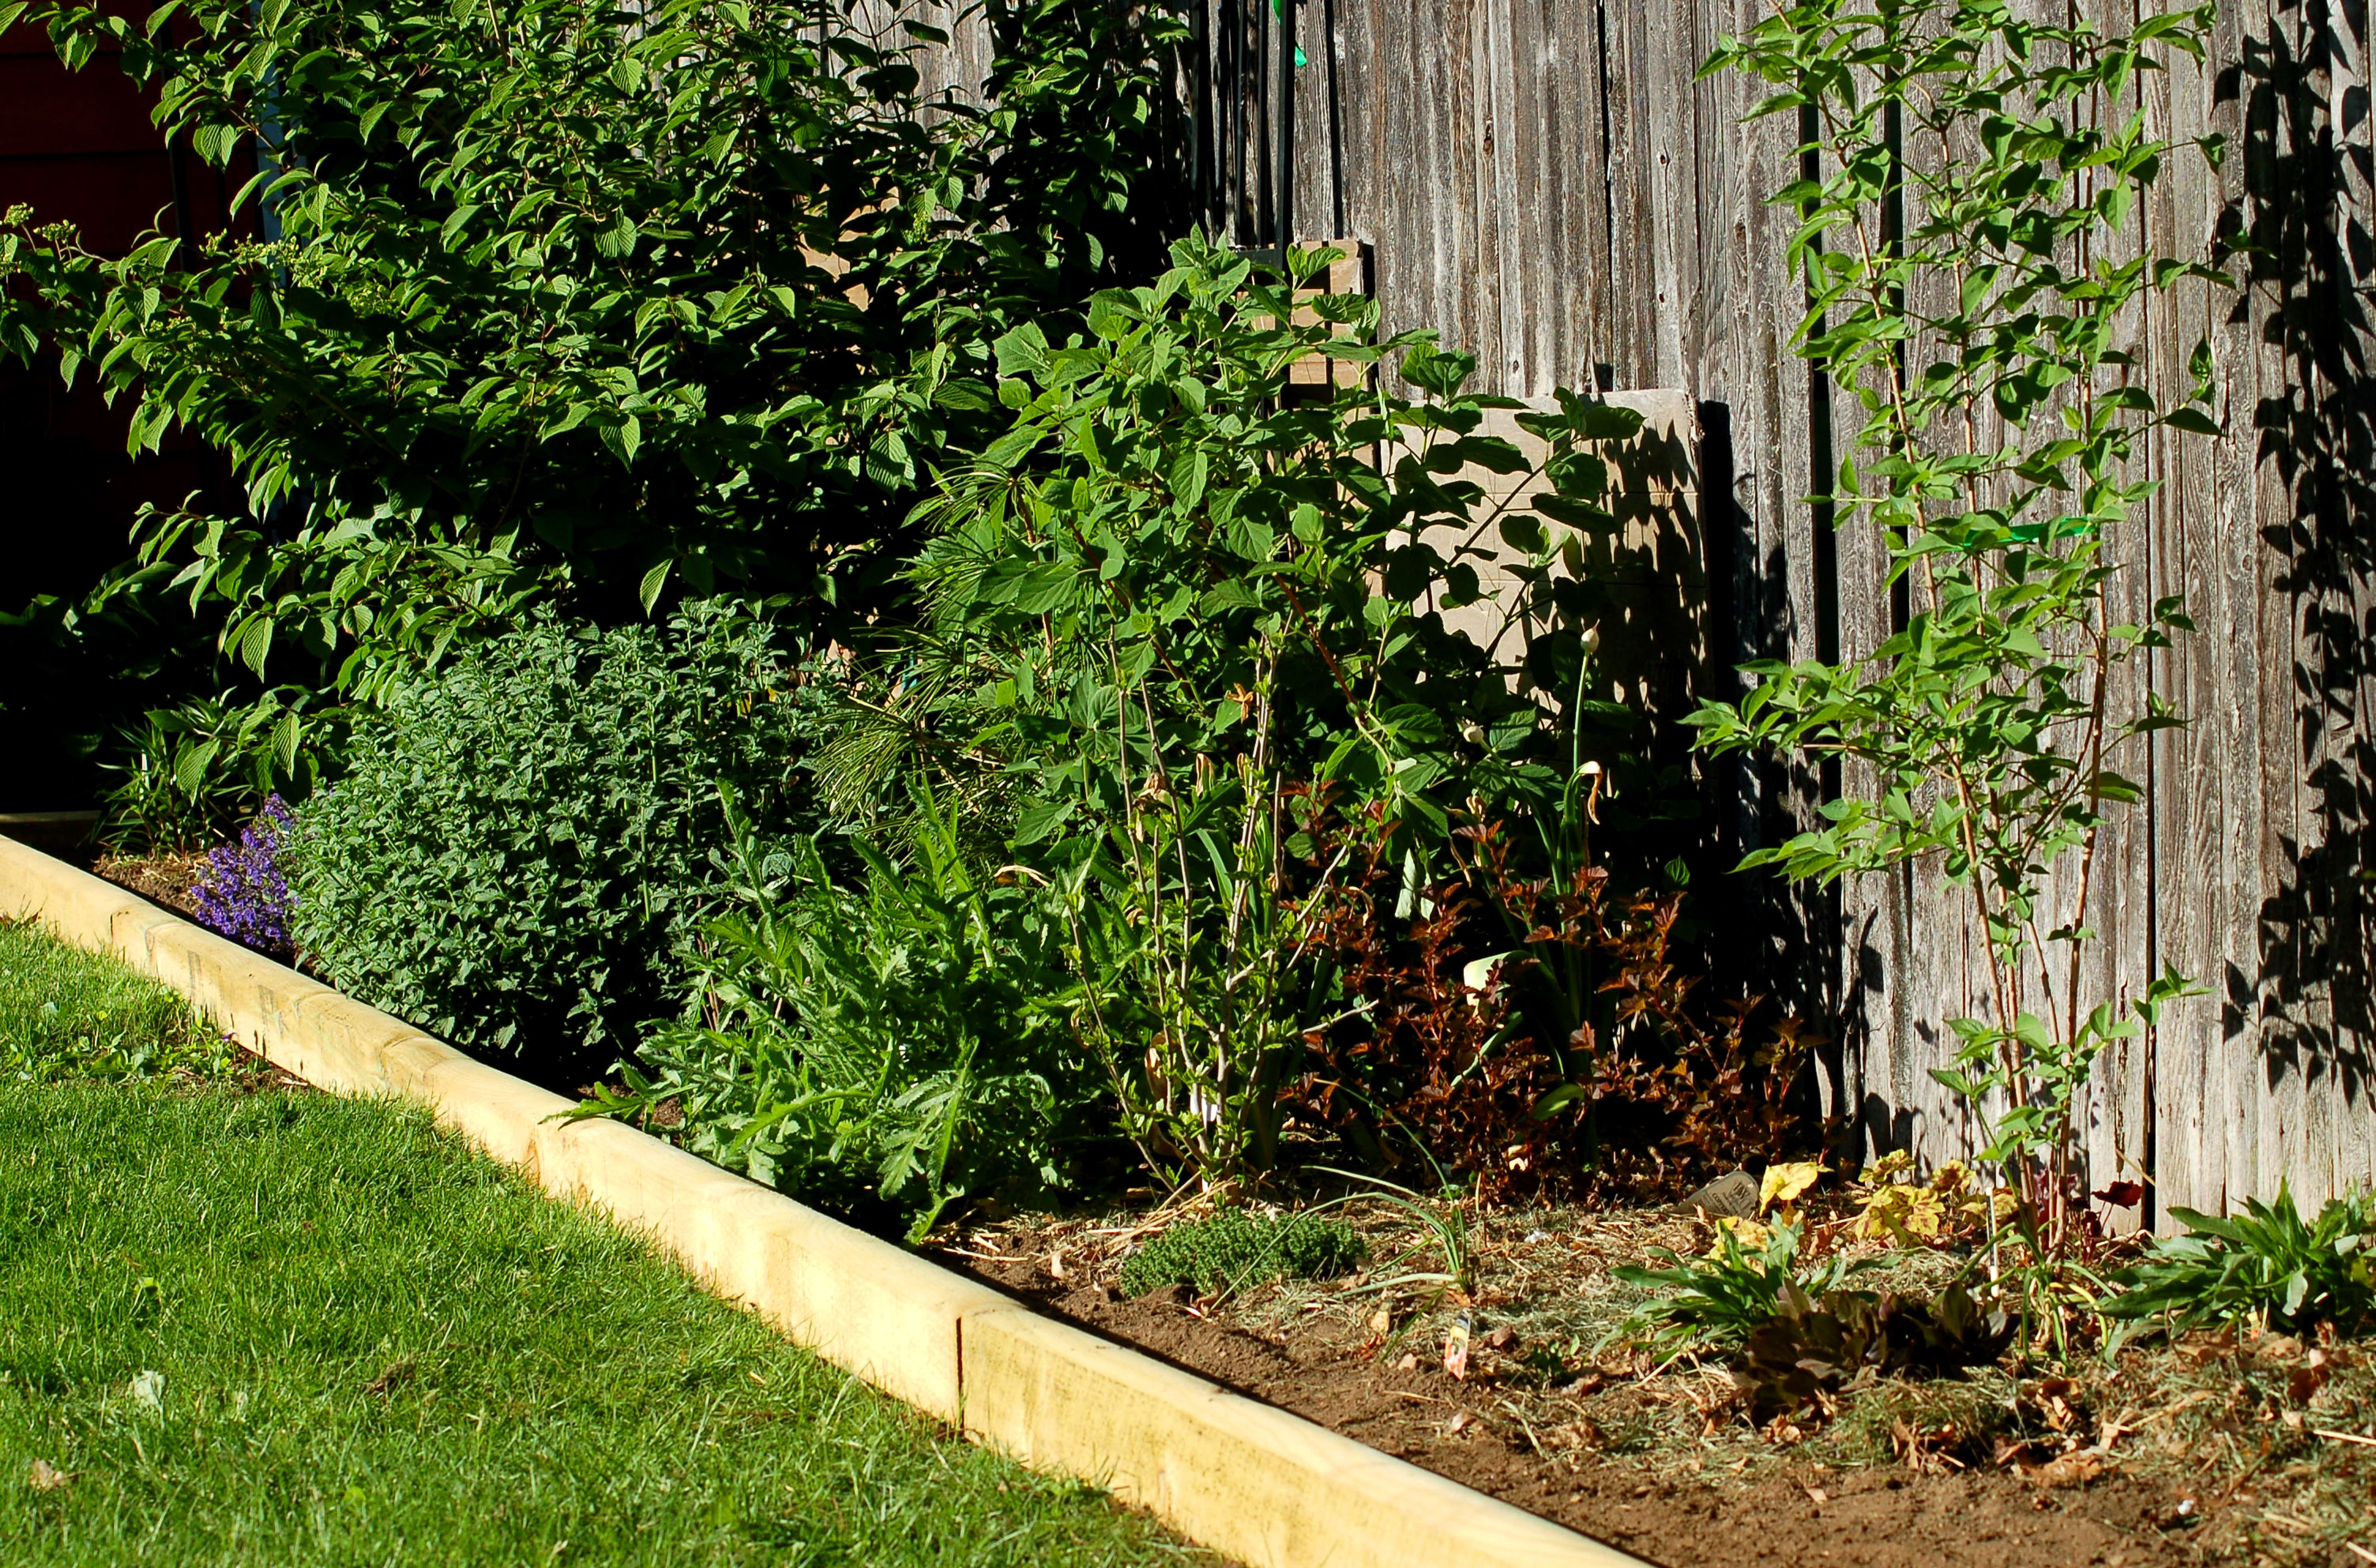 ajuga ground cover bugleweed plants too loud in a yard